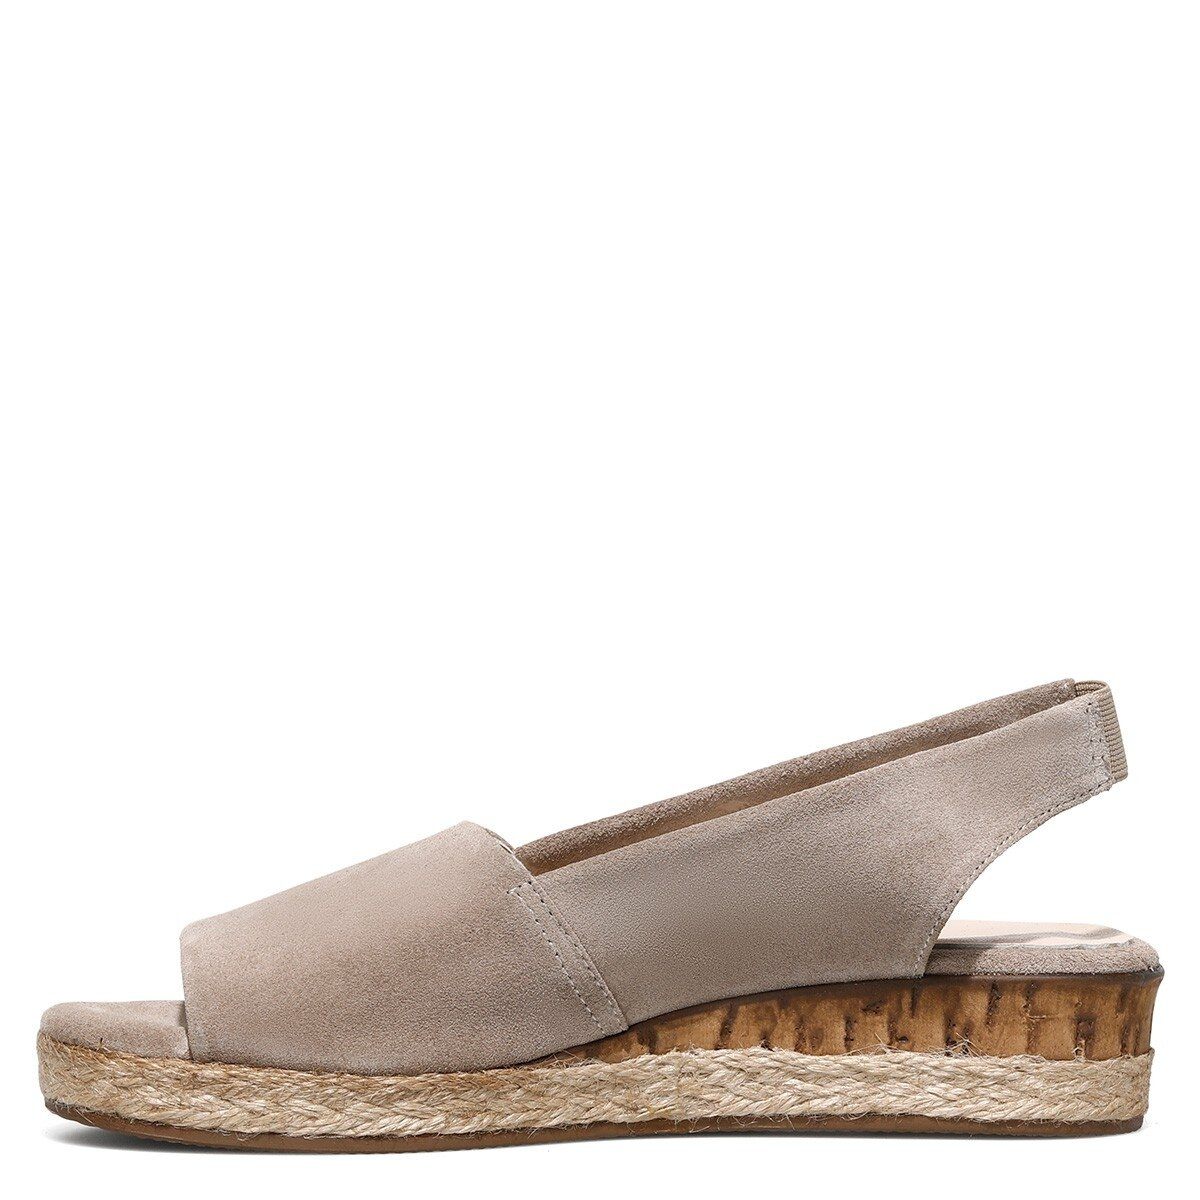 POMELIA 1FX Vizon Kadın Dolgu Topuk Sandalet